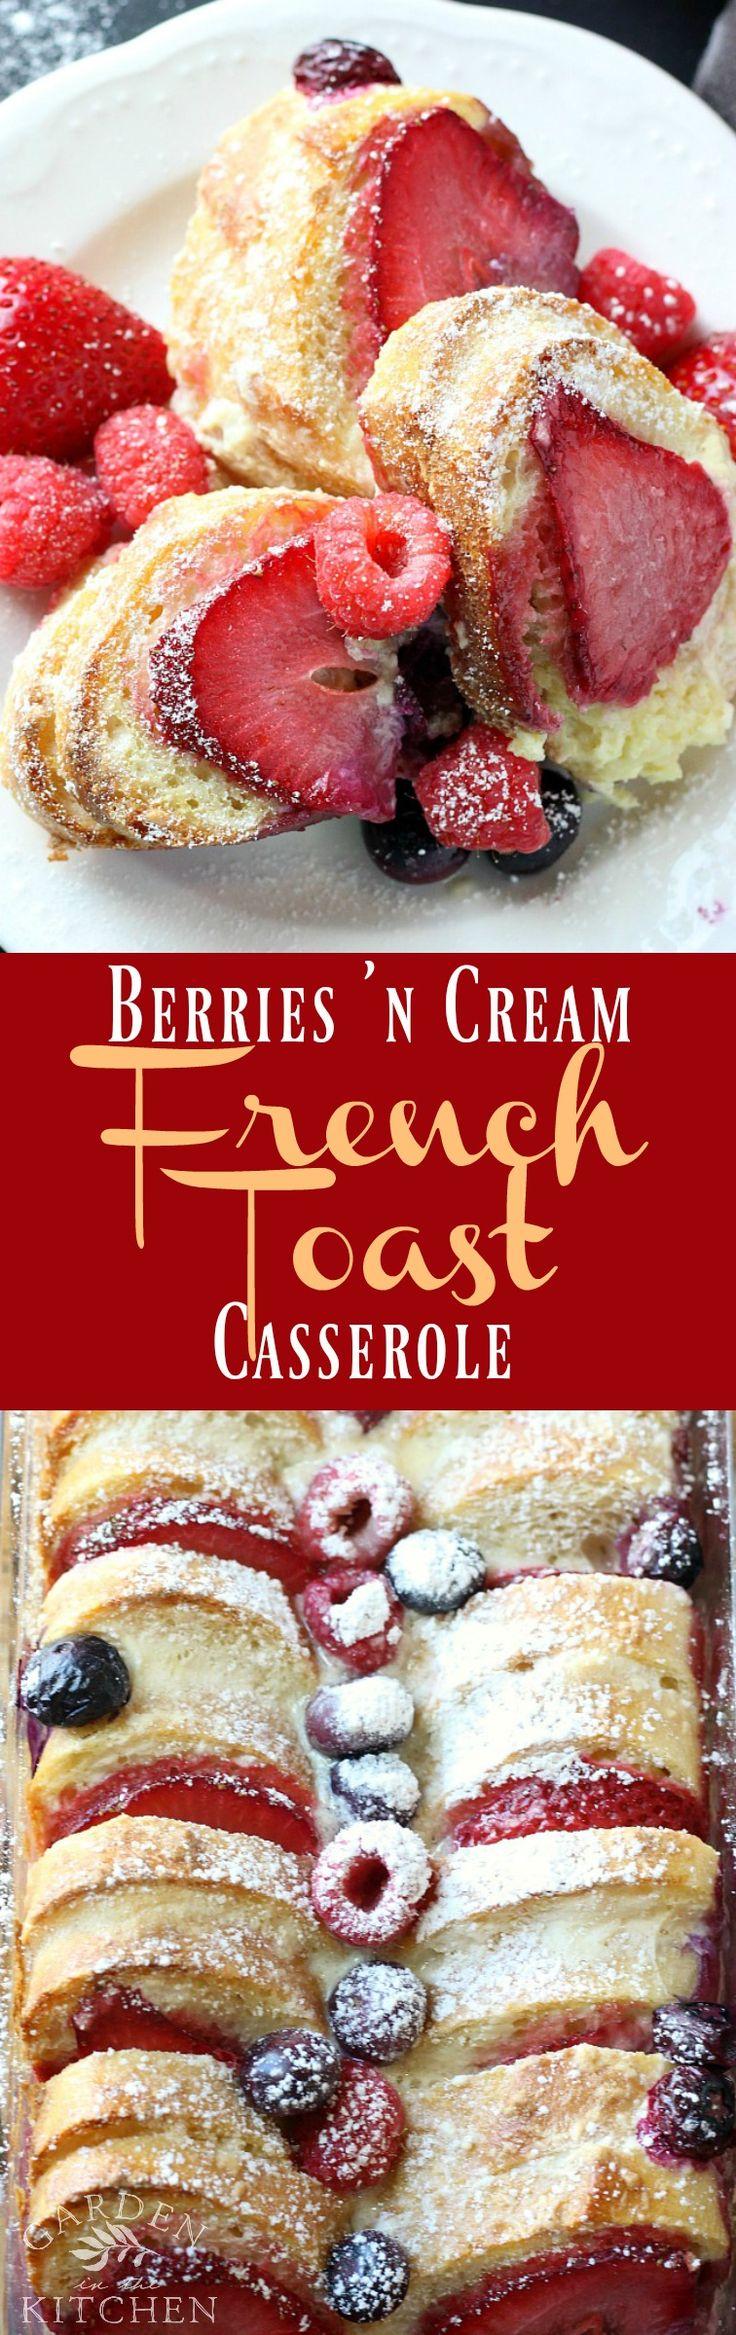 Berries 'n Cream French Toast Casserole